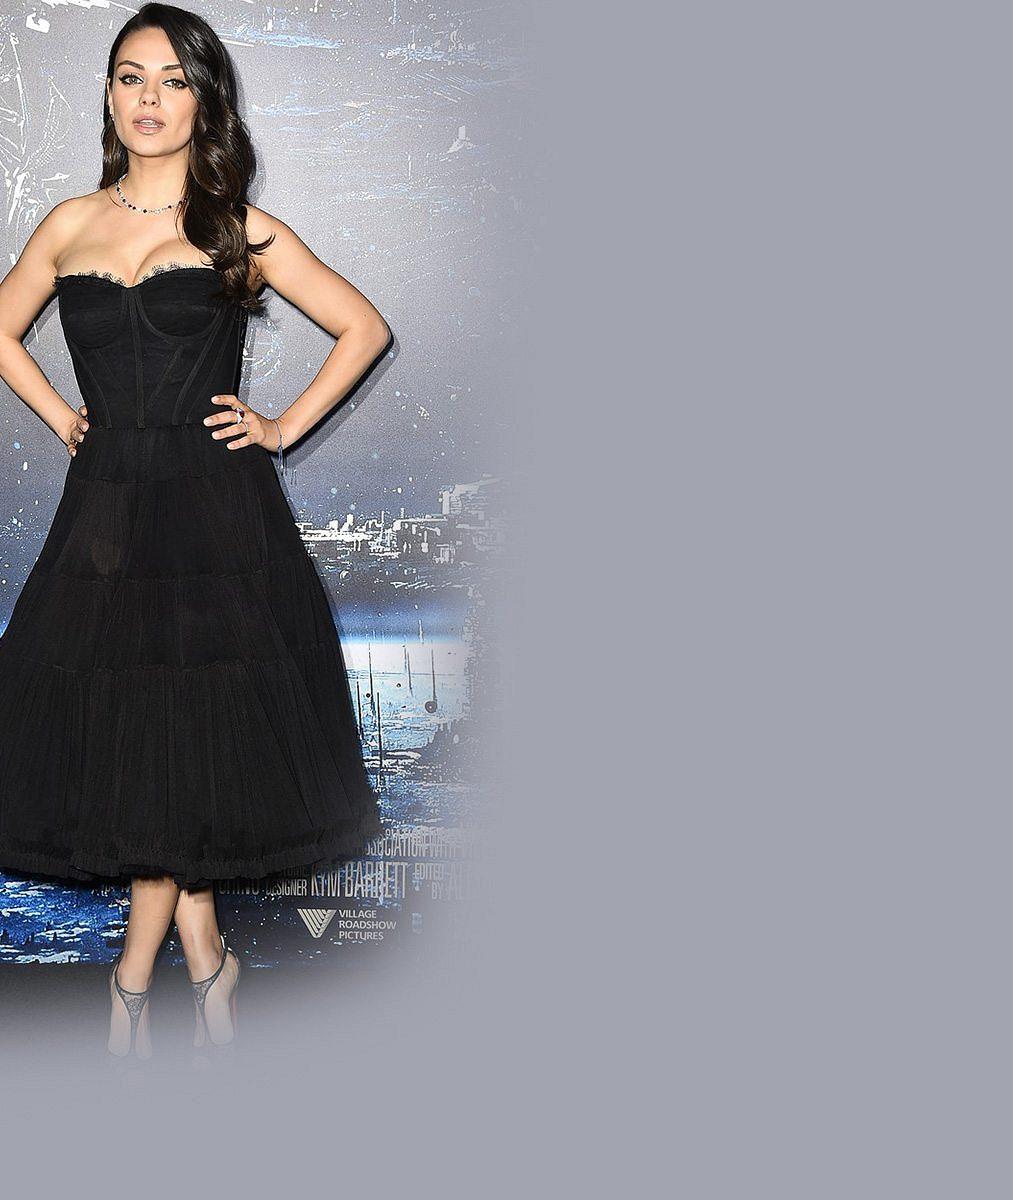 Nejkrásnější hollywoodská maminka: Mila Kunis poprvé od porodu na černém koberci